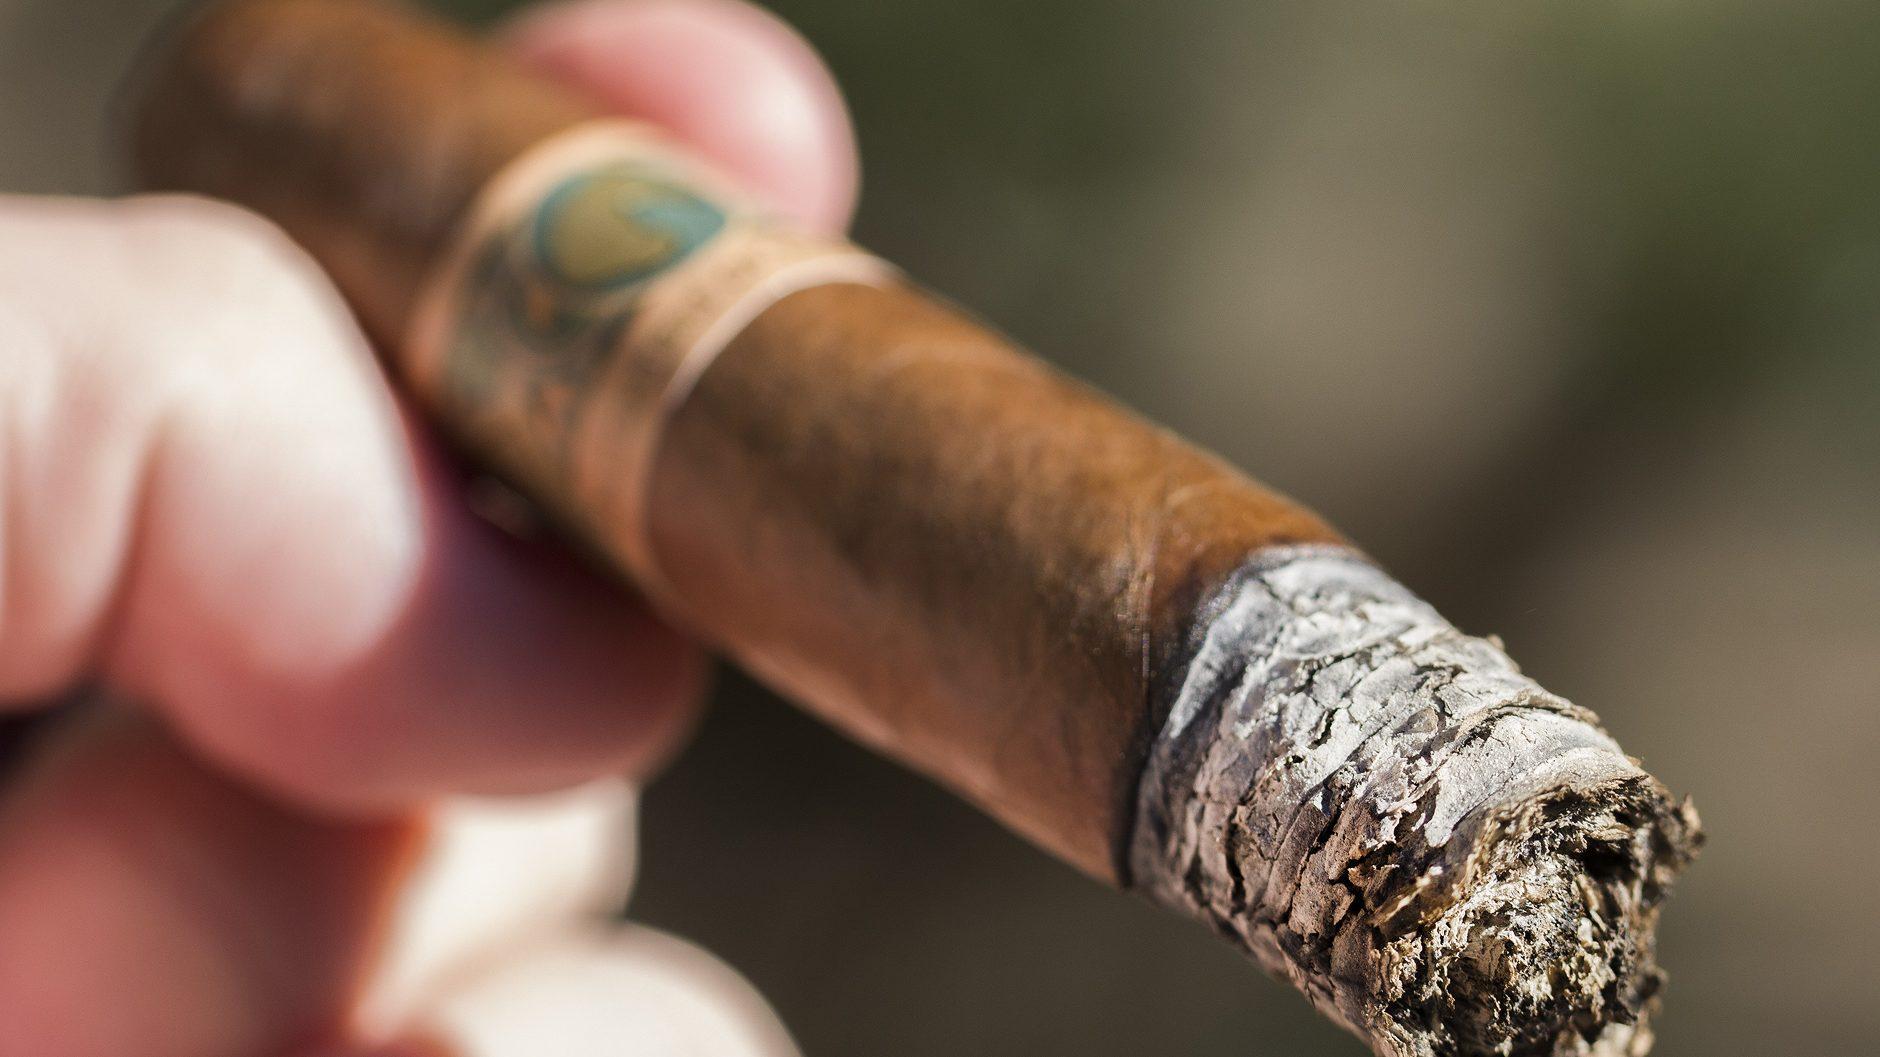 Pony Express, Exclusive Small Batch Cigar from Casdagli